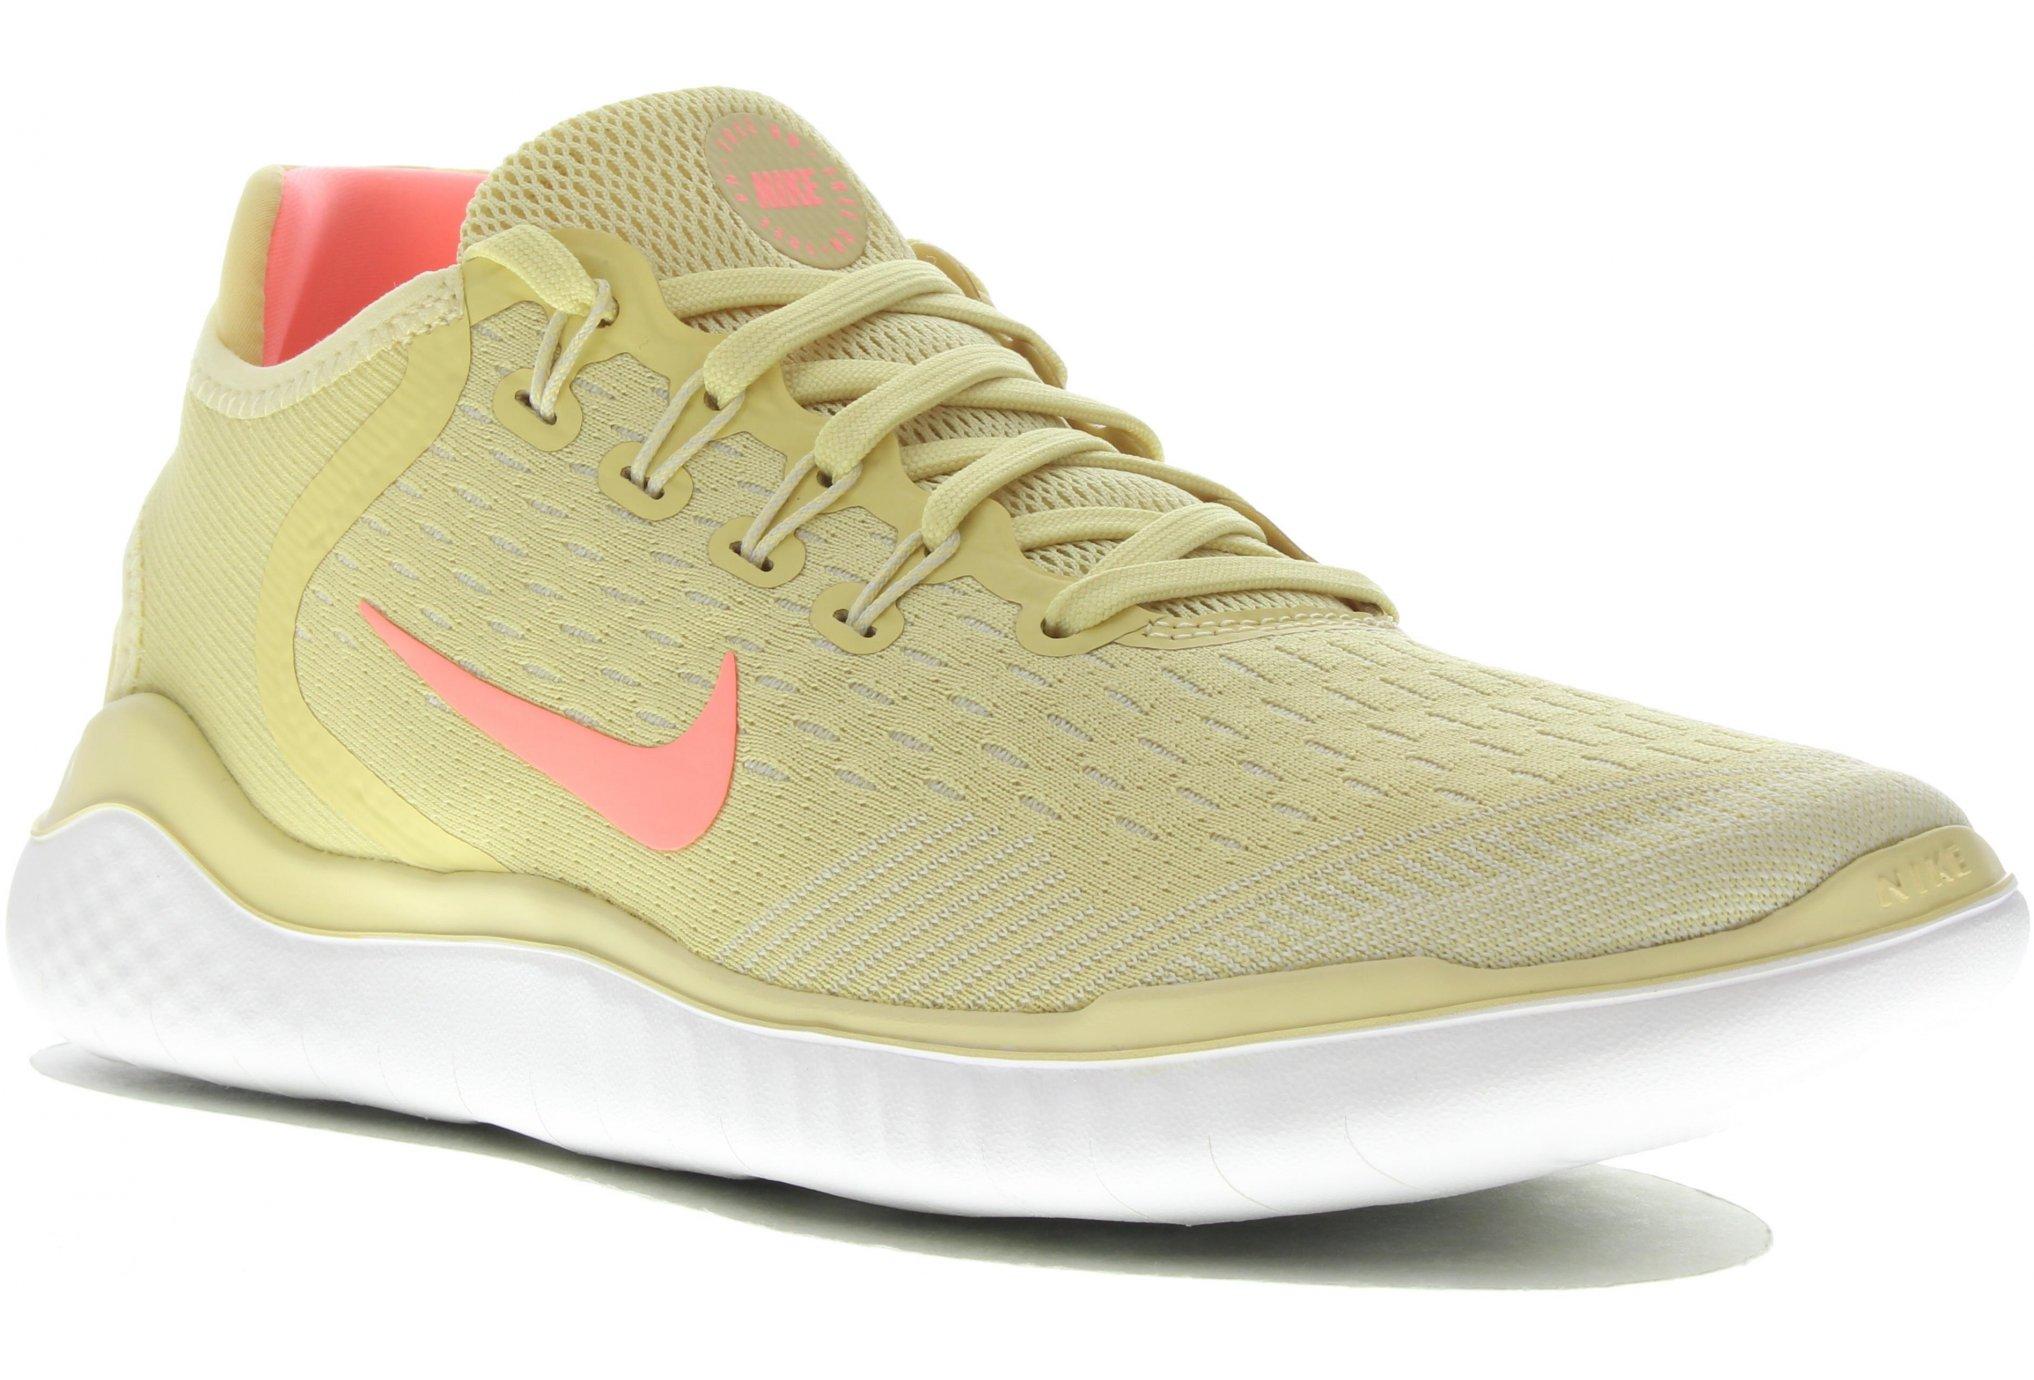 Nike Free RN 2018 Summer déstockage running